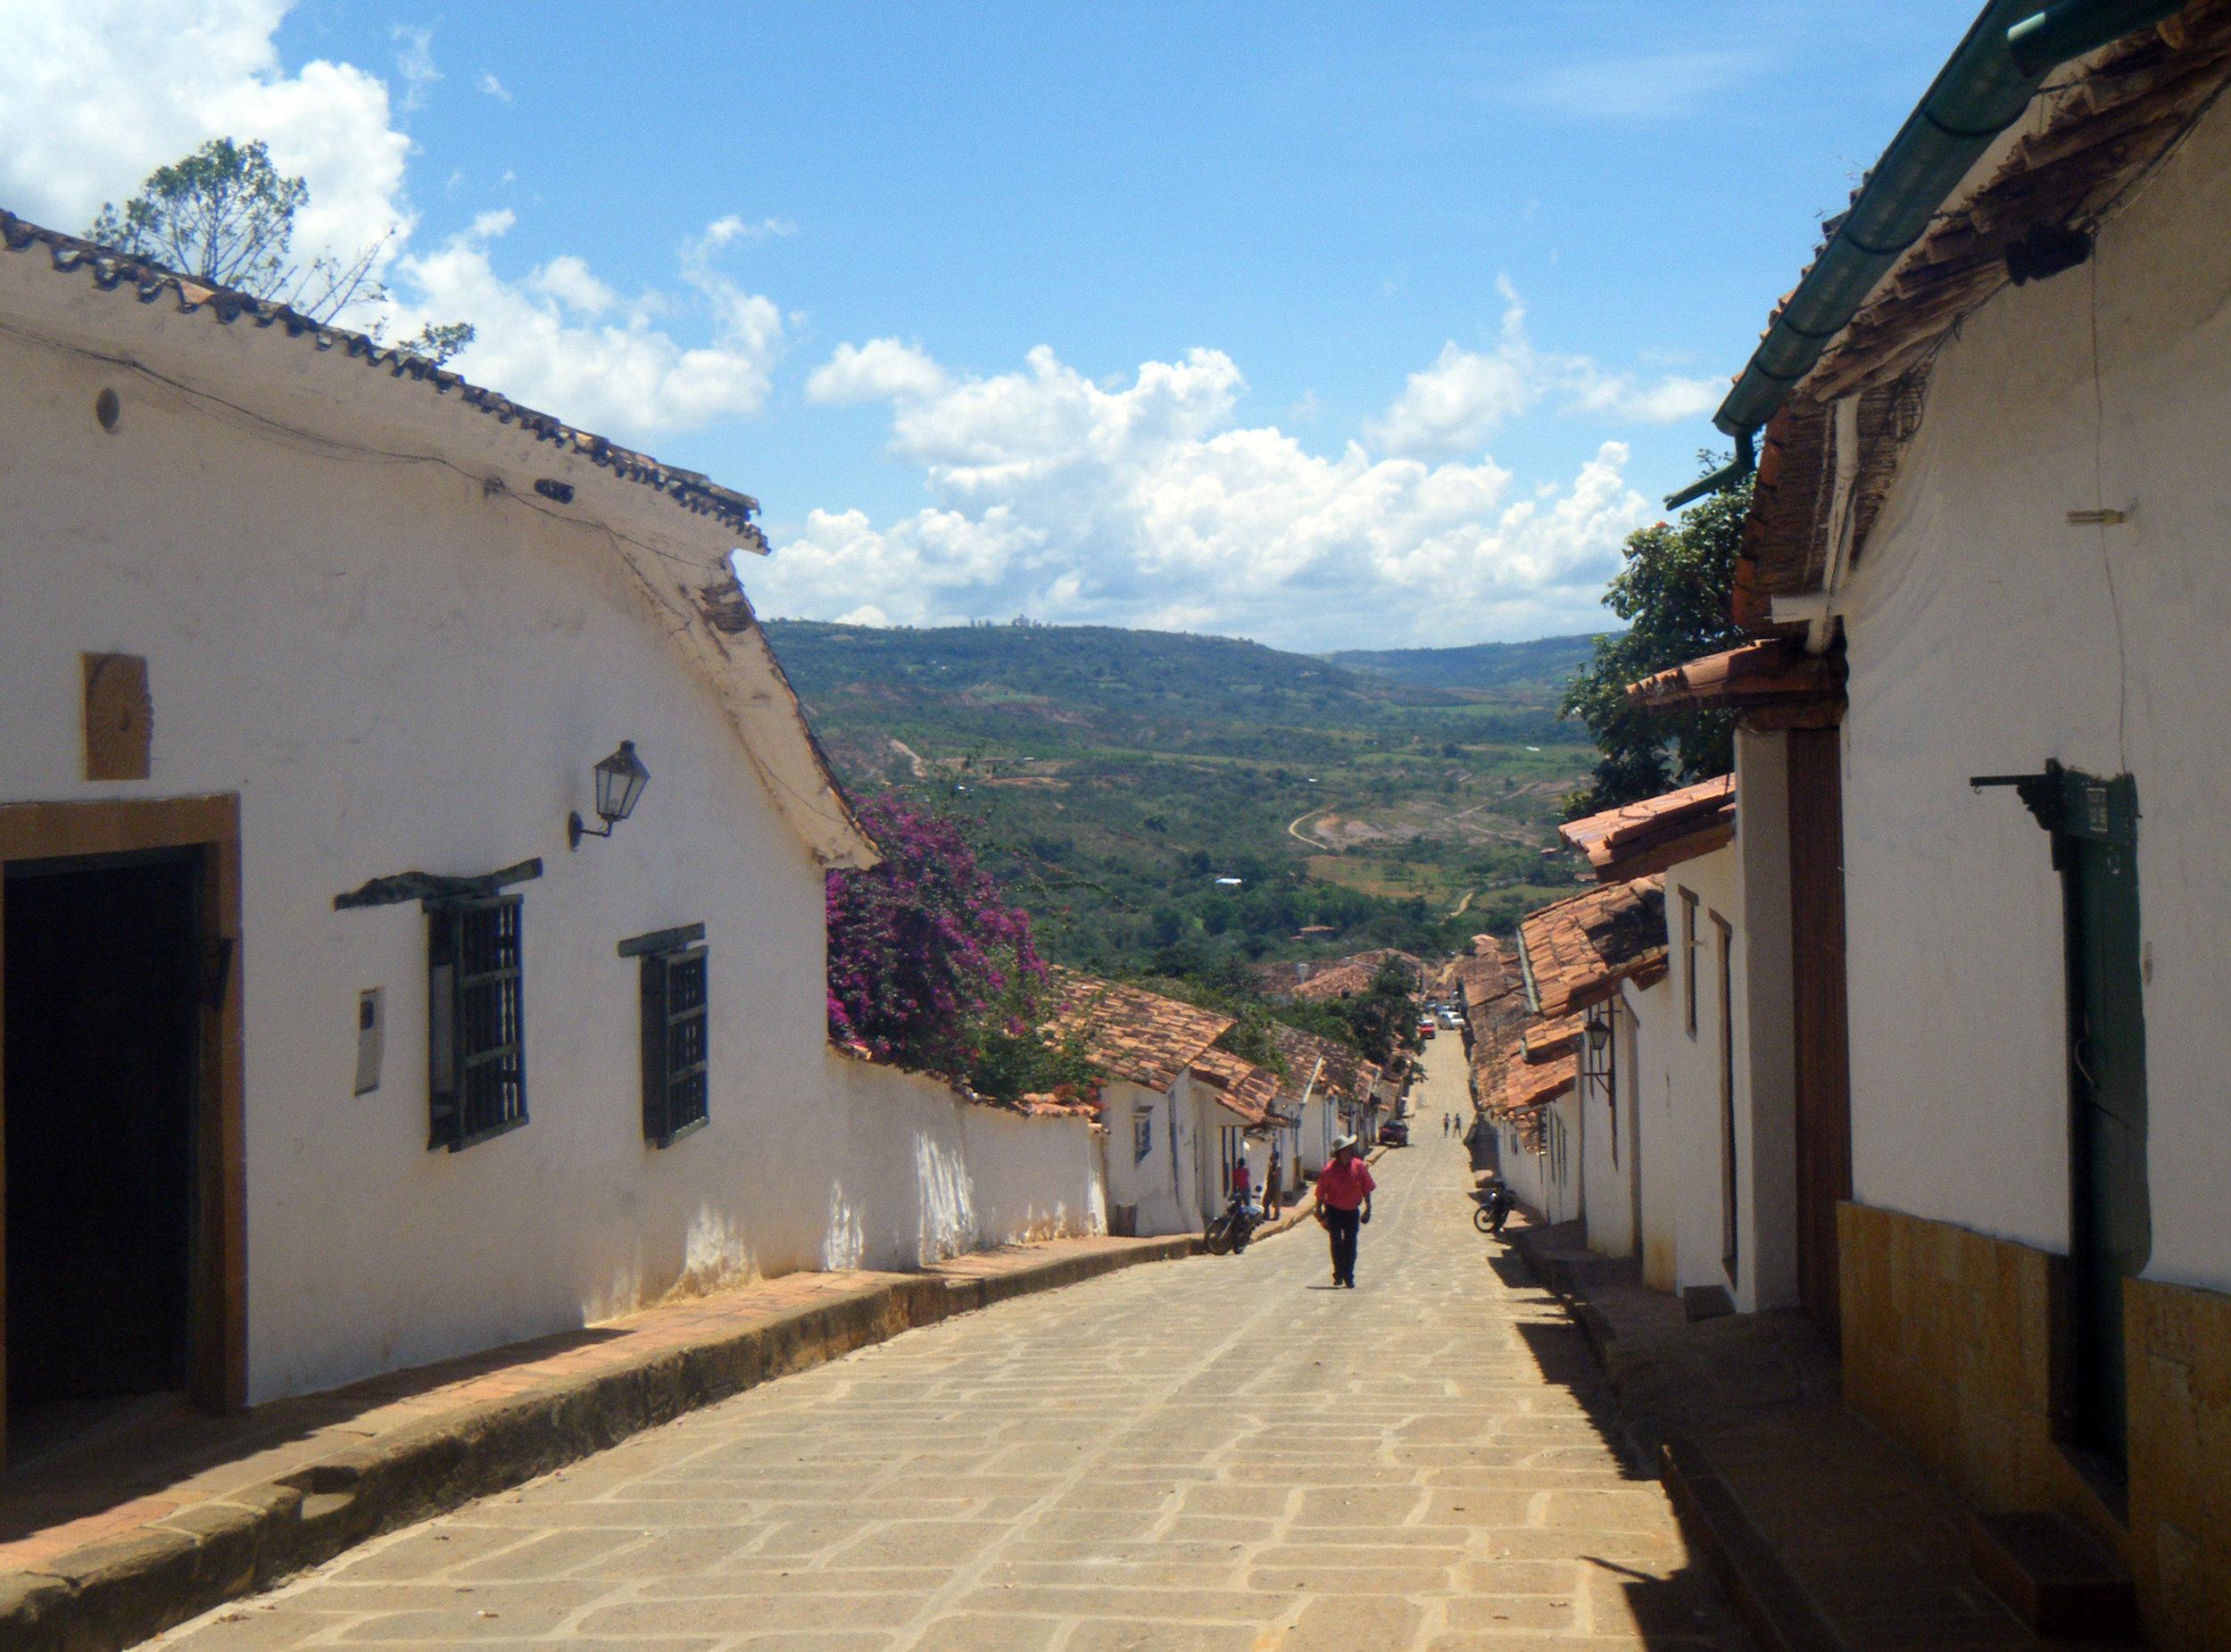 Barichara views.jpg